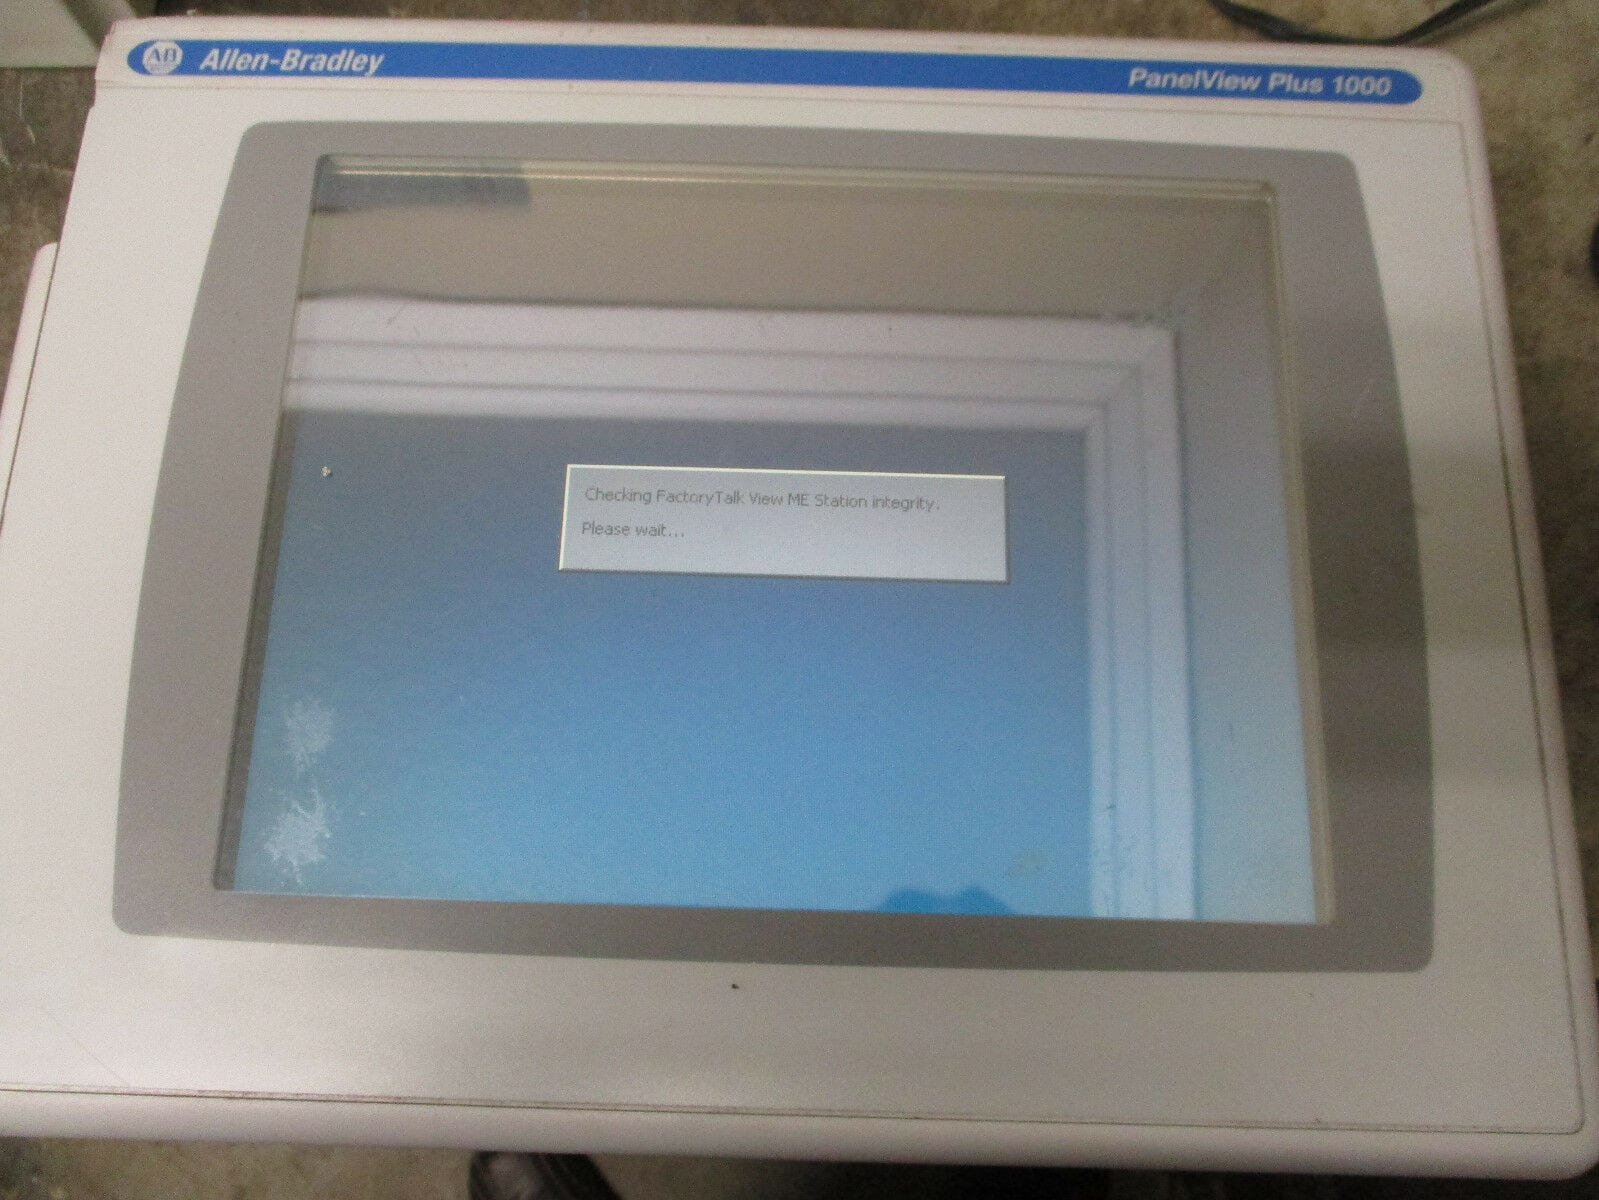 Allen Bradley 2711P-T10C6A2 Panelview Plus 1000 HMI display Module Ser  A*Tested*